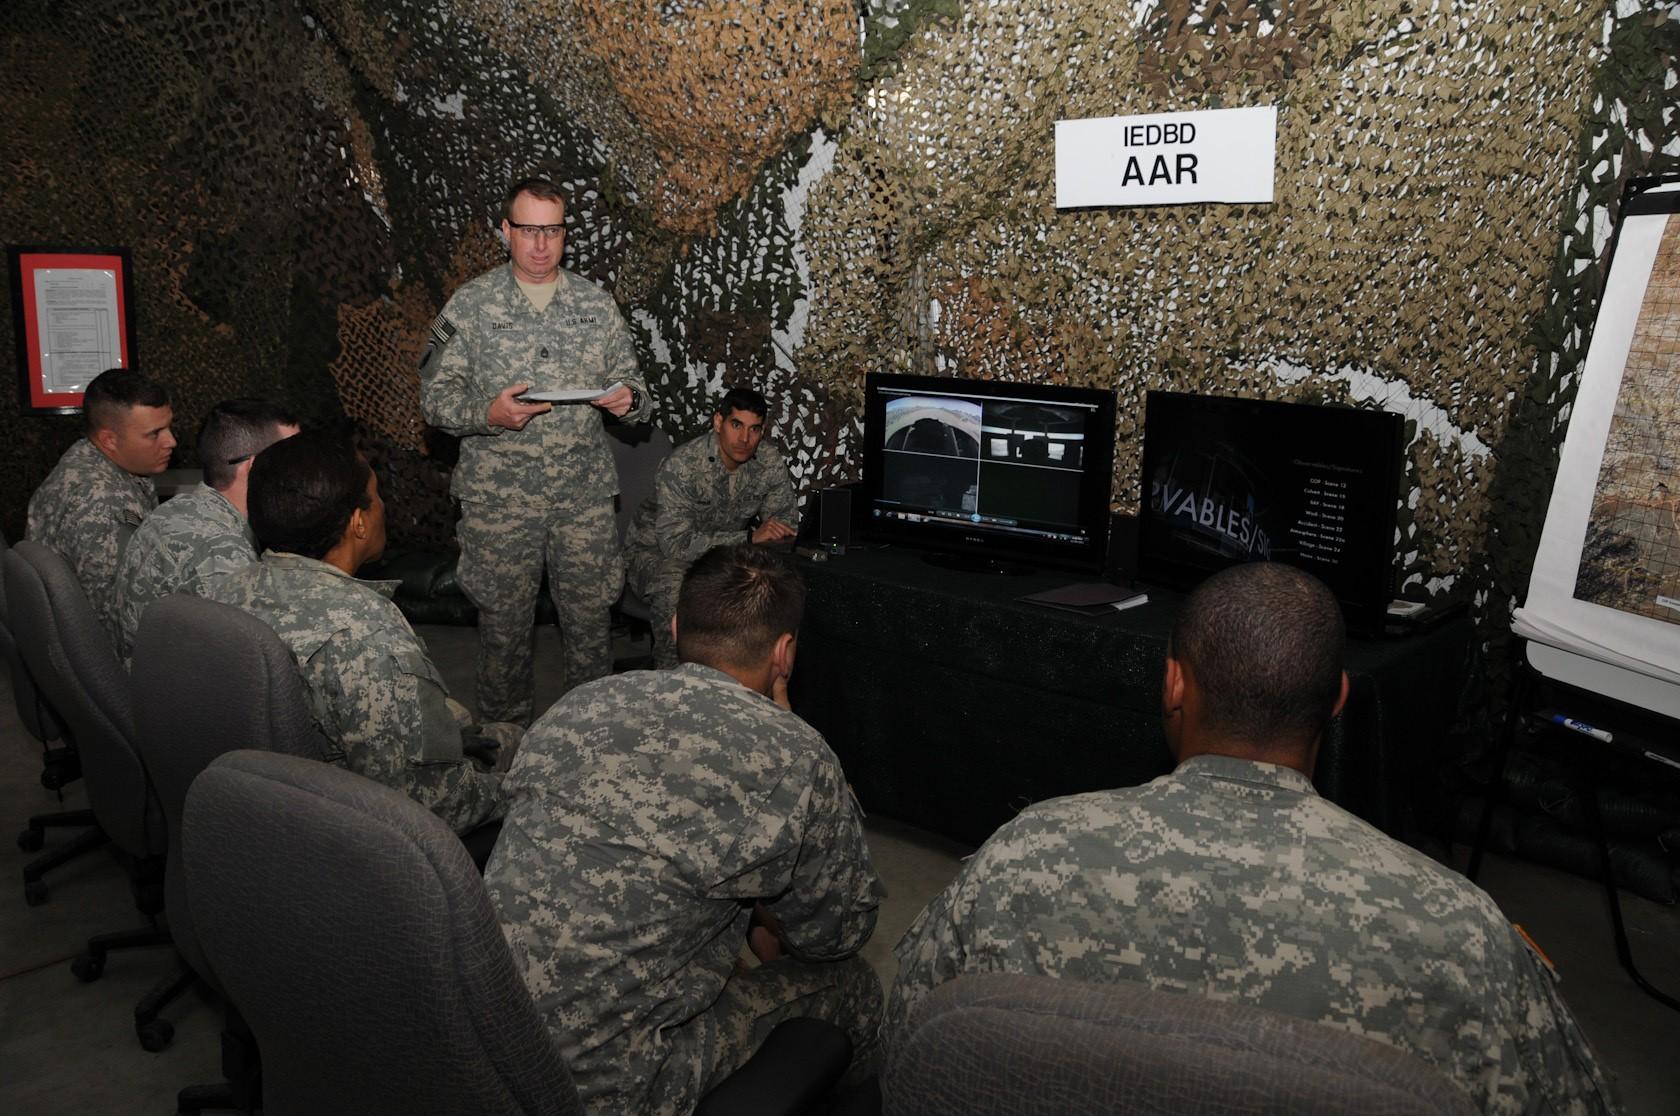 army 3 general orders essay